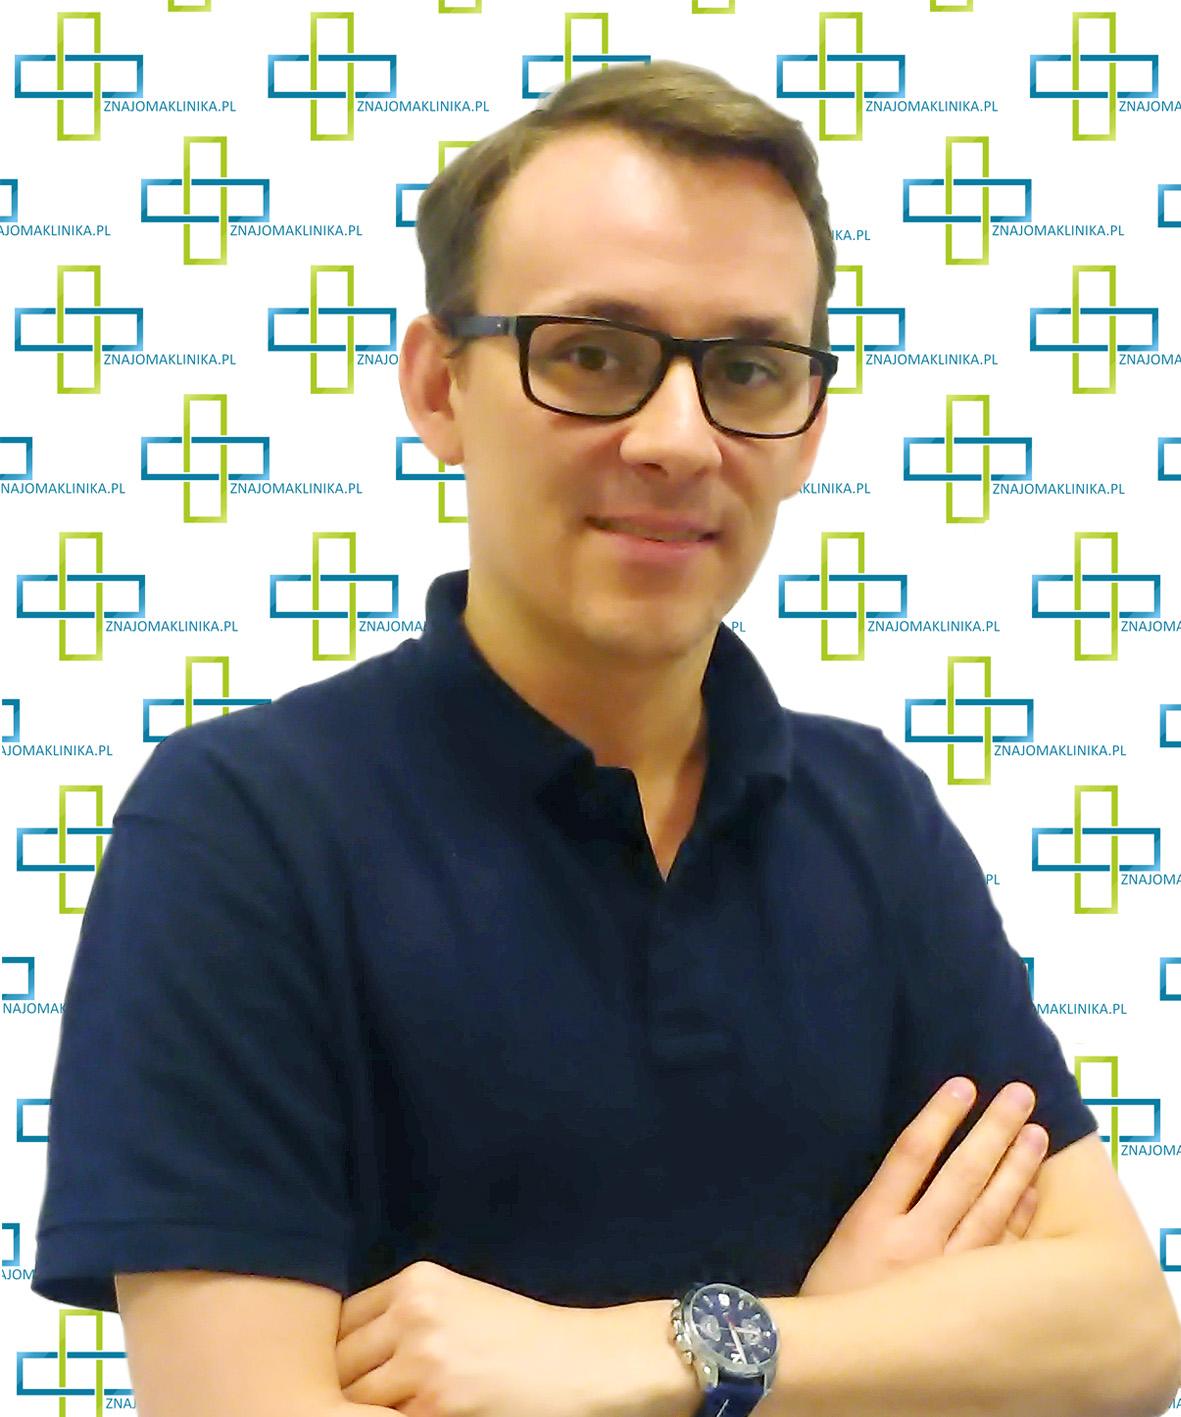 mgr Maciej Kopciński